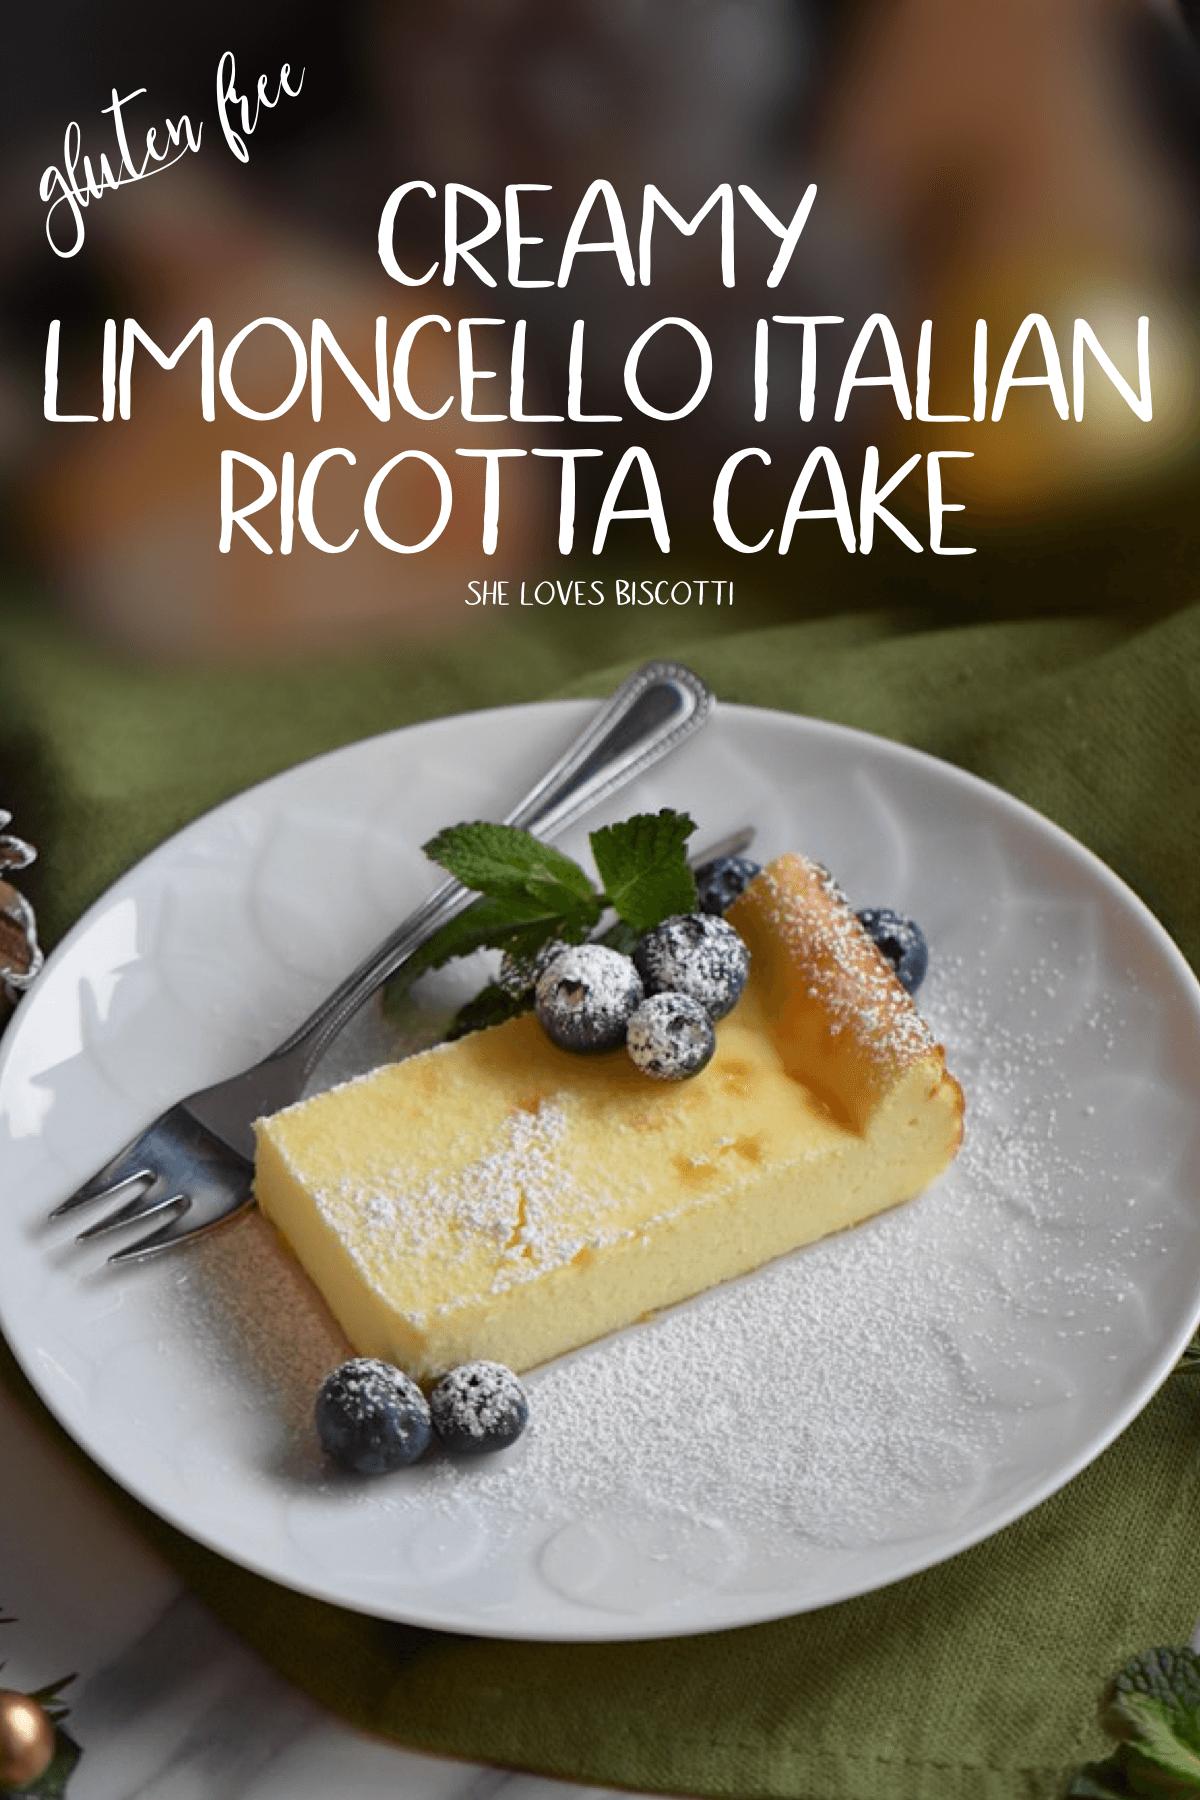 Creamy Limoncello Italian Ricotta Cake Recipe || Easy Italian Cake Recipe || Simple Italian Ricotta Cake #ricottacake #limoncello #Italianricottacake #Italiancake #ricotta #CreamyItaliancake #glutenfreecake #flourlesscake